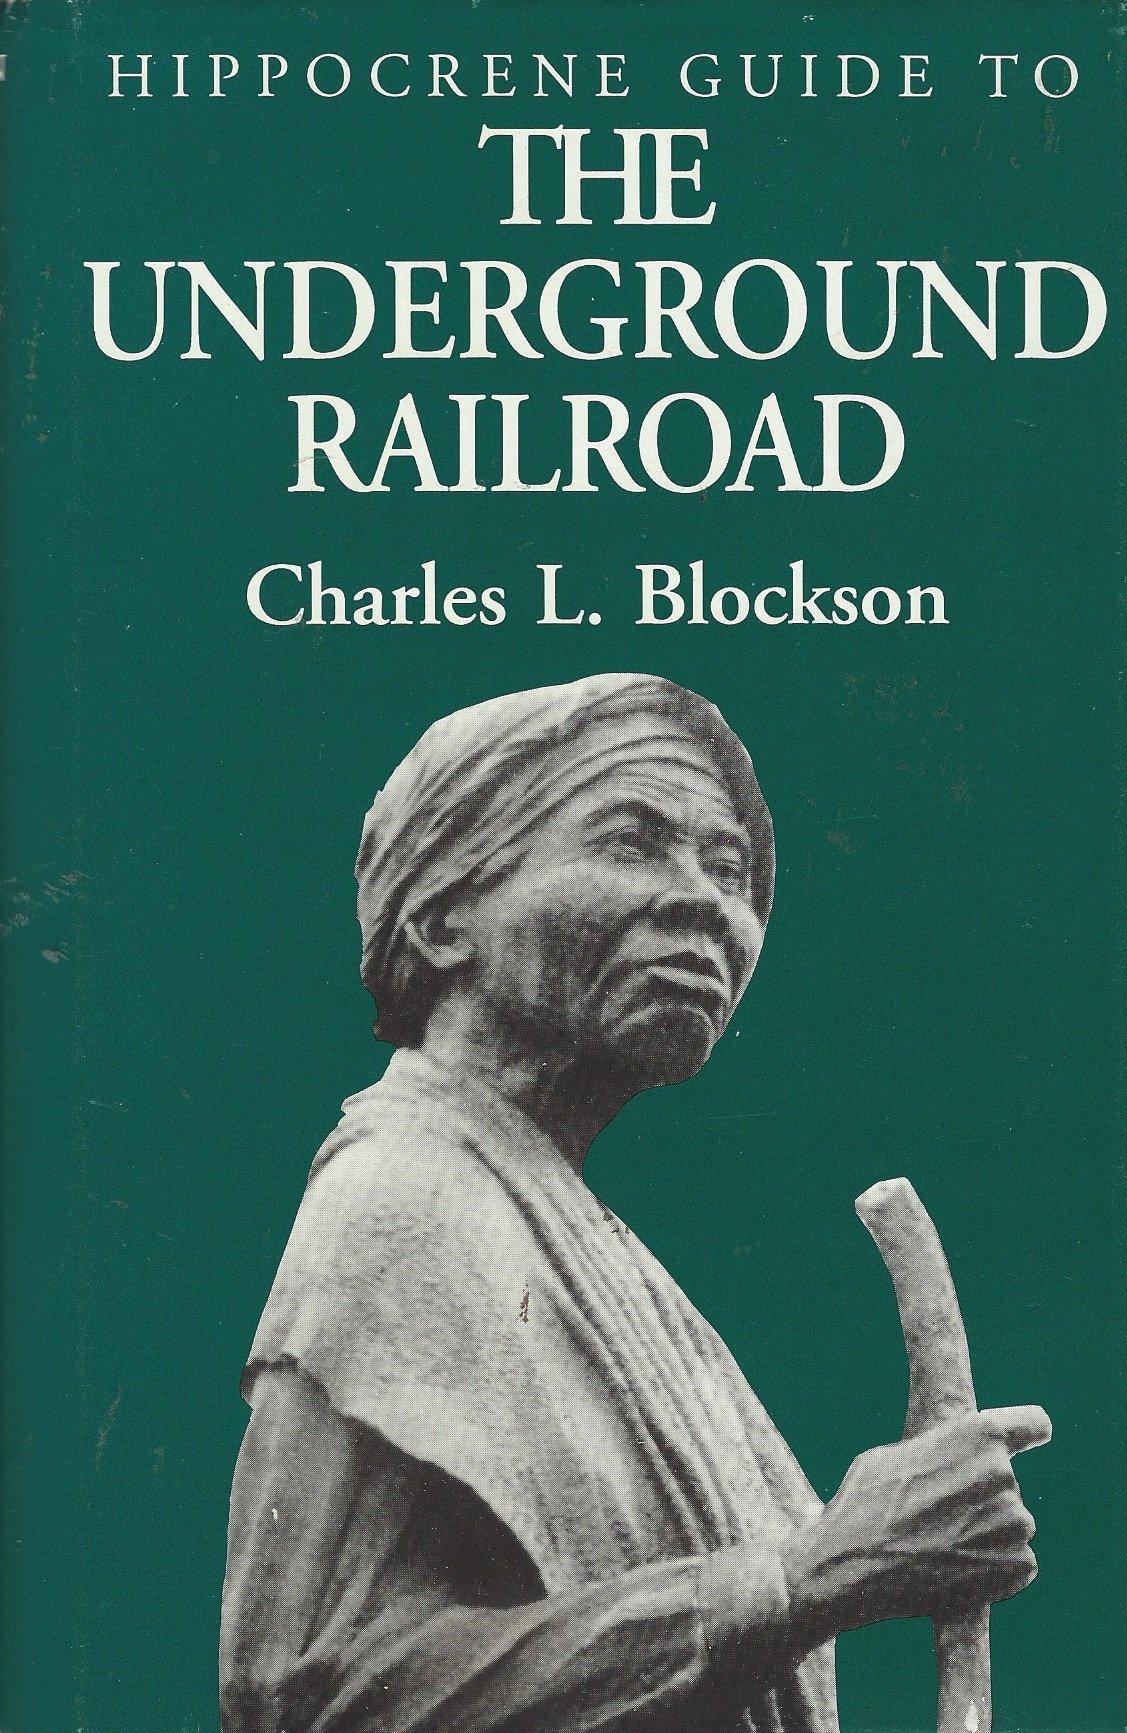 Charles L. Blockson, African American History, Black History, Underground Railroad, KOLUMN Magazine, KOLUMN